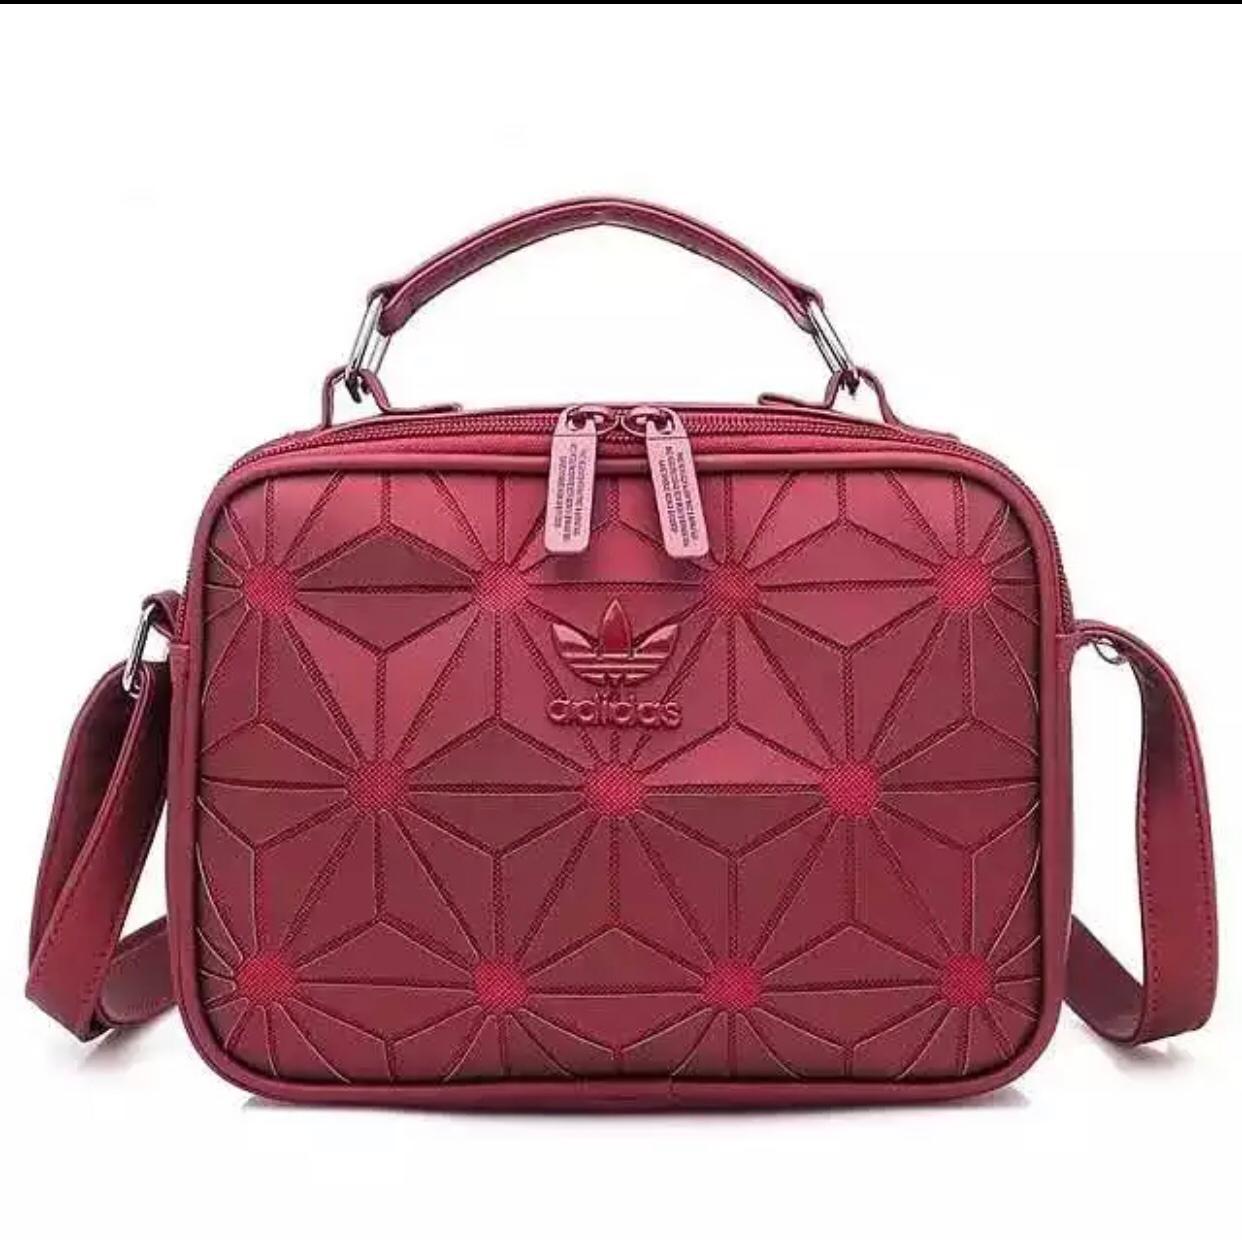 Adidas Issey Miyake Sling Bag